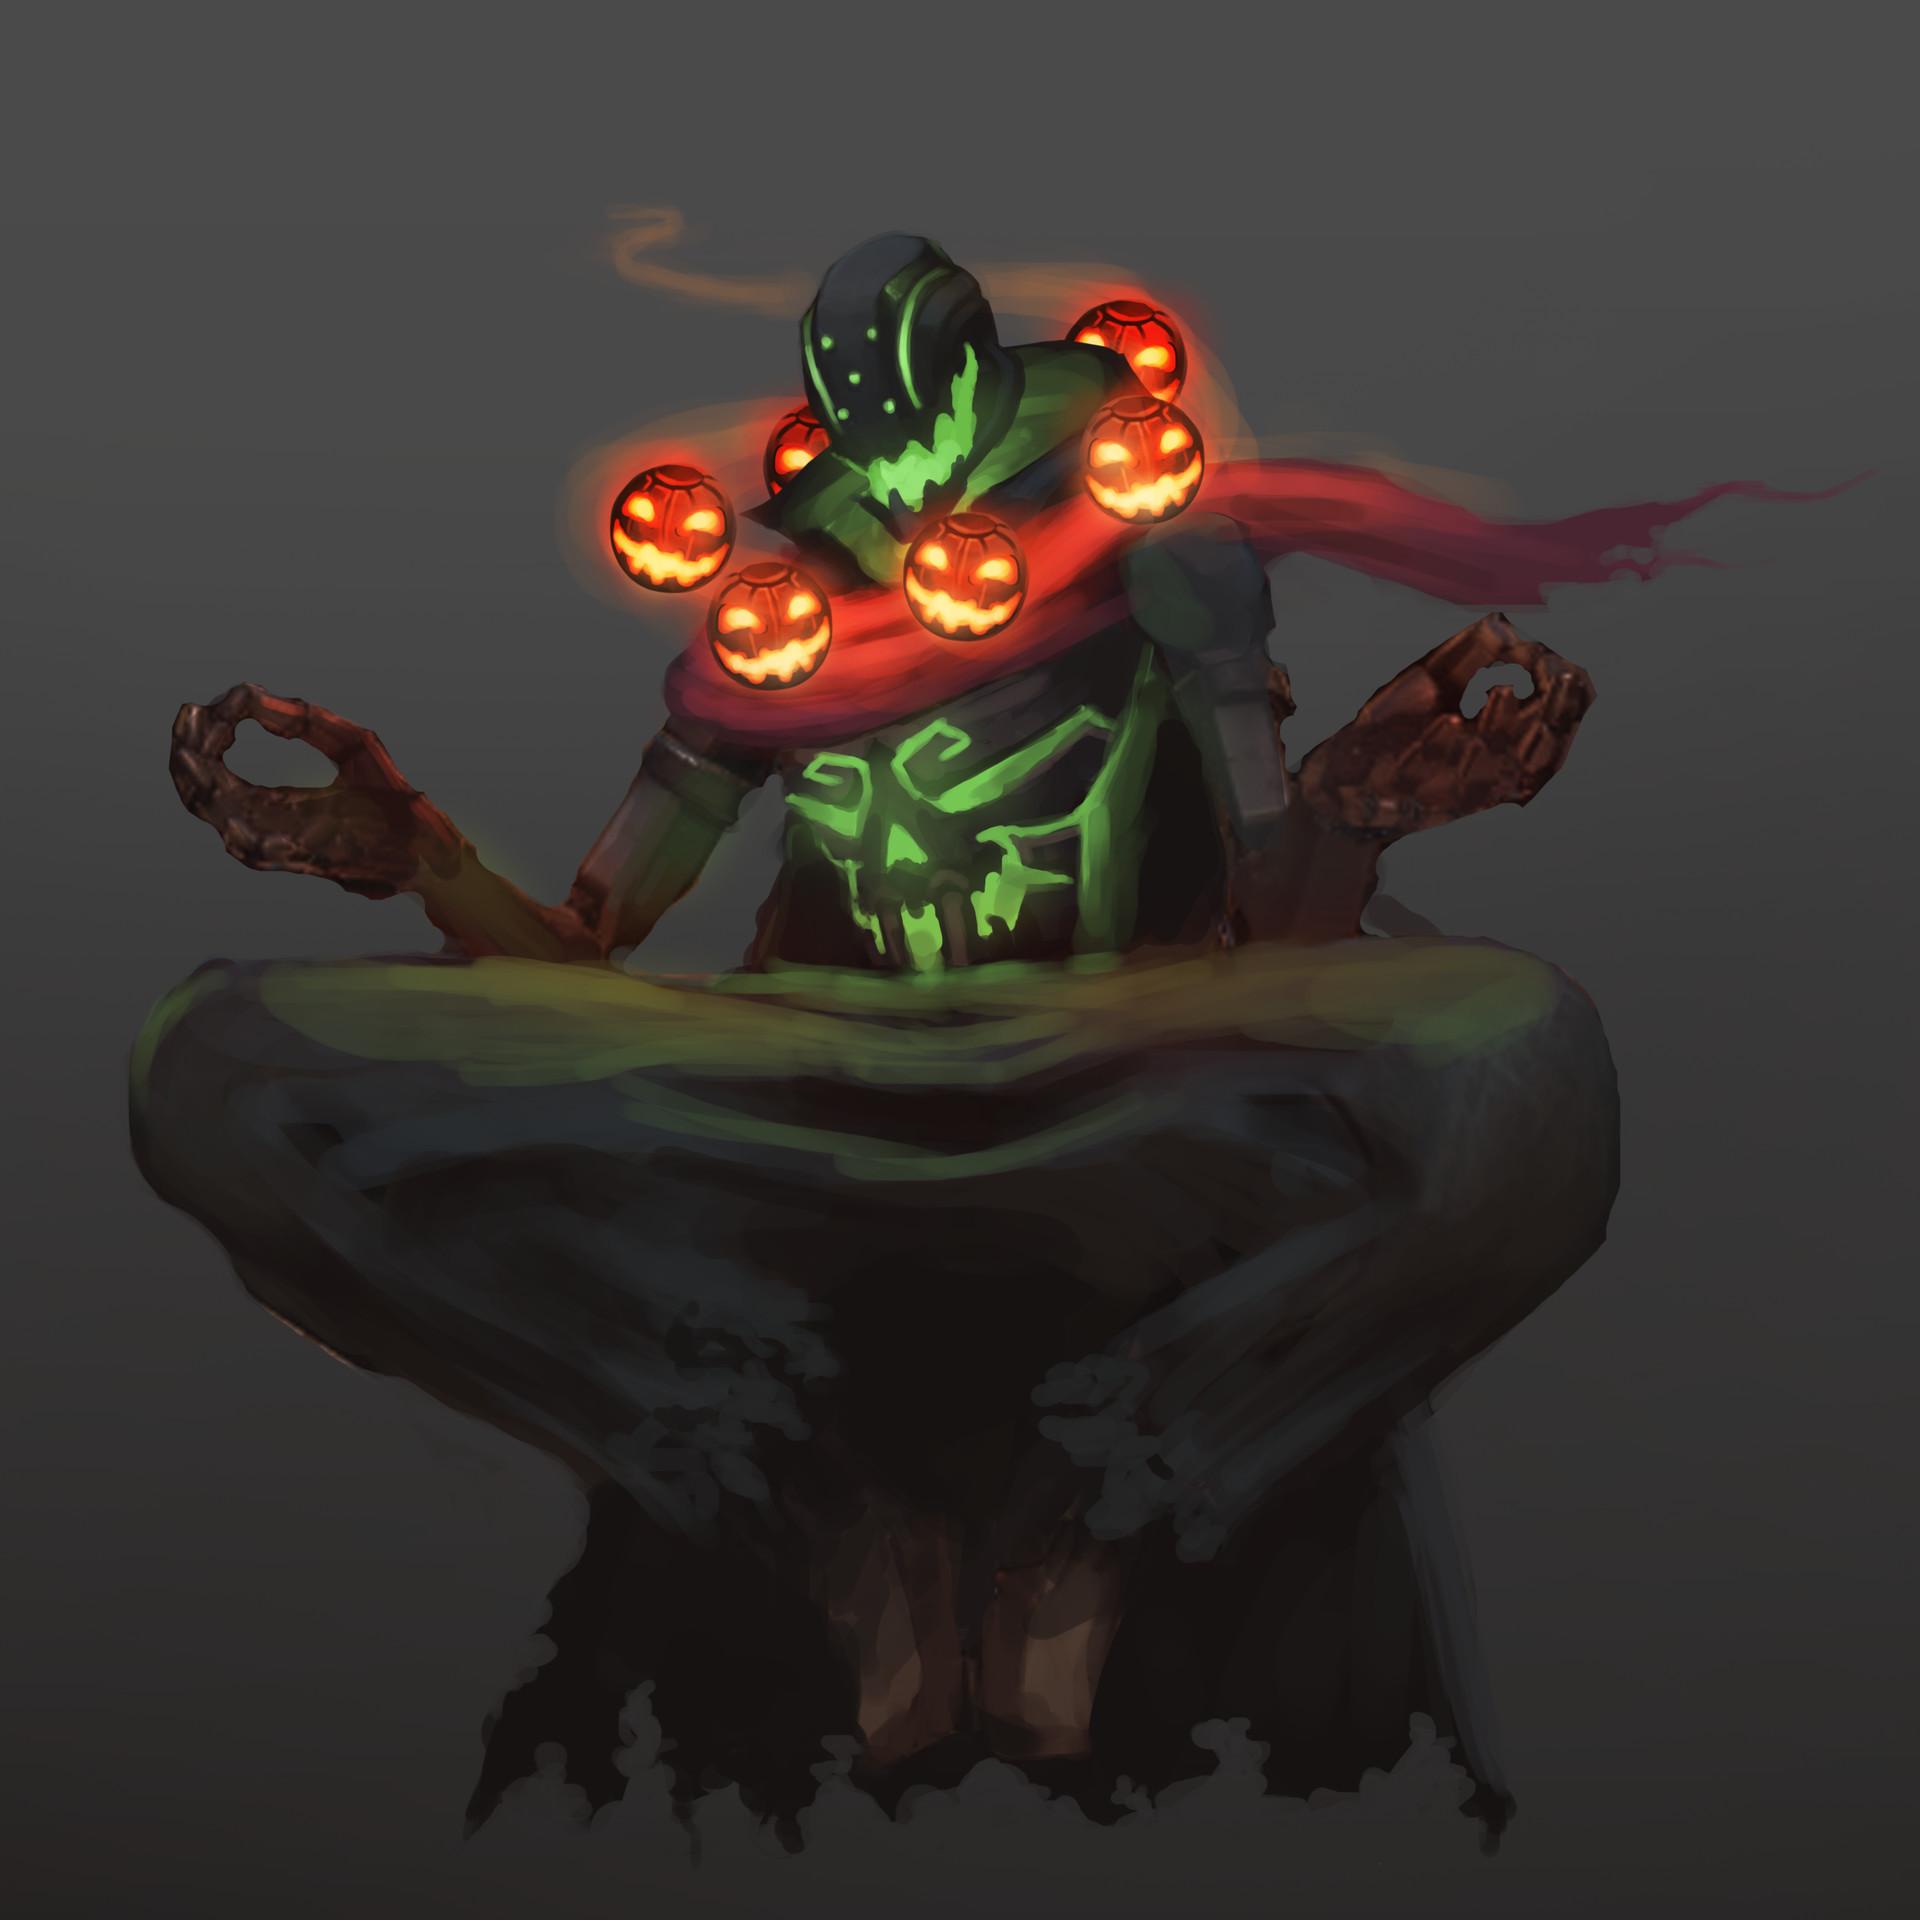 Halloween skins wishlist - Overwatch Message Board for PlayStation ...